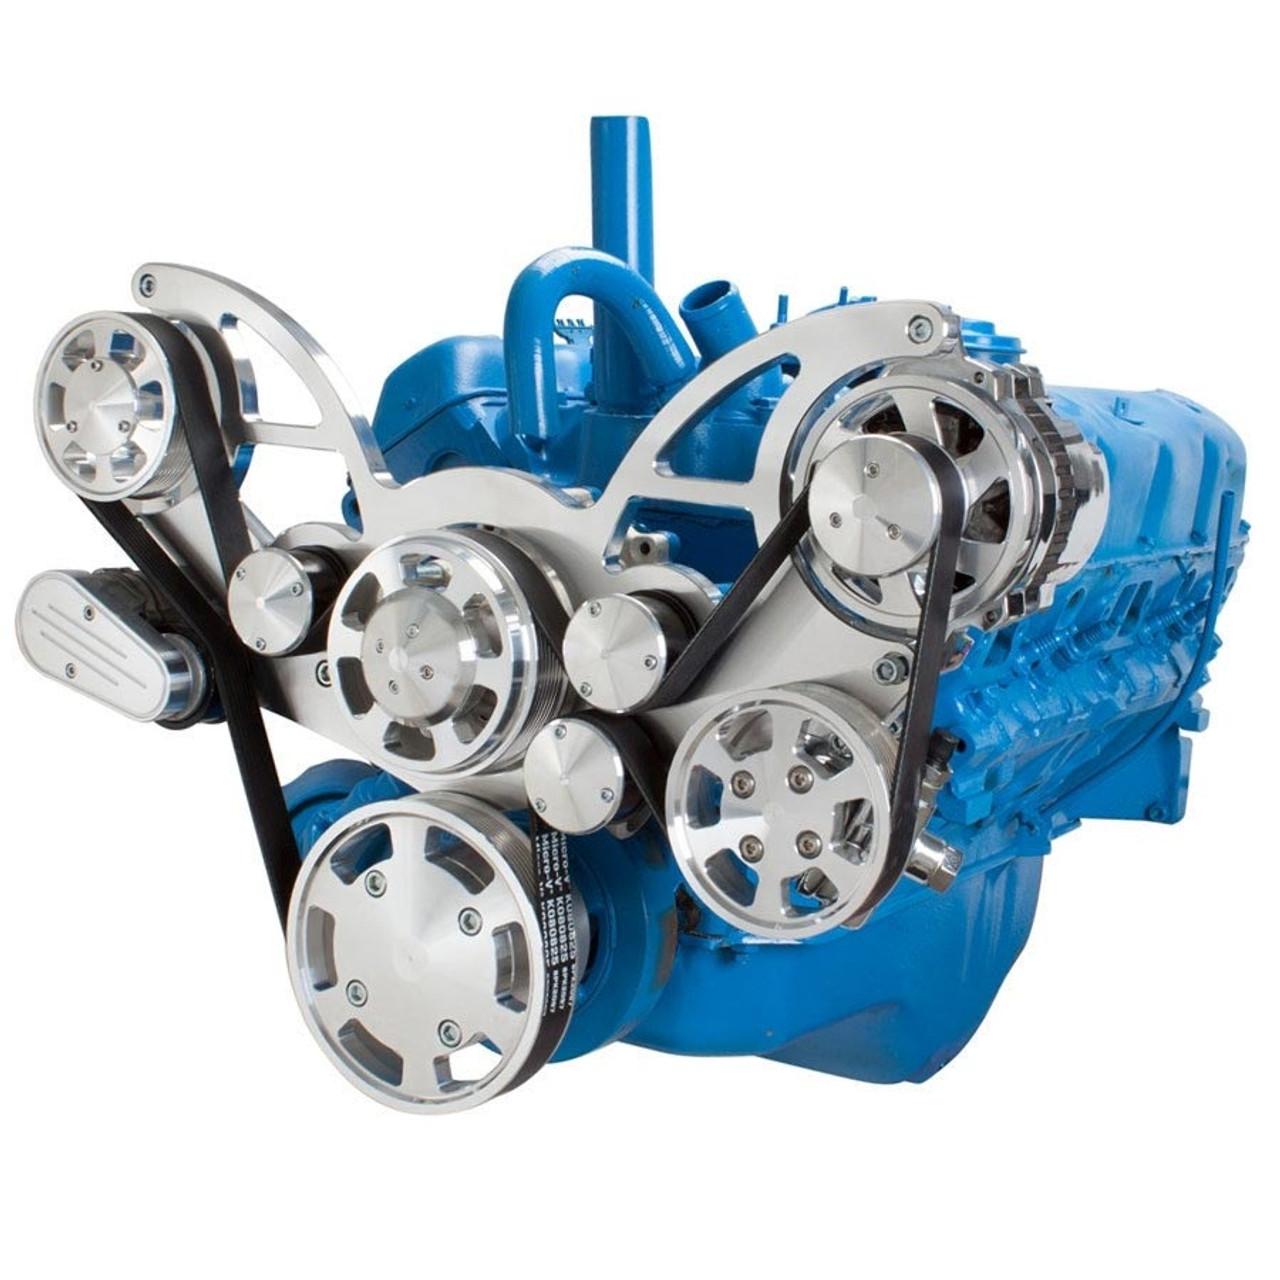 serpentine system for amc jeep 306 360 401 power steering alternator  [ 900 x 900 Pixel ]